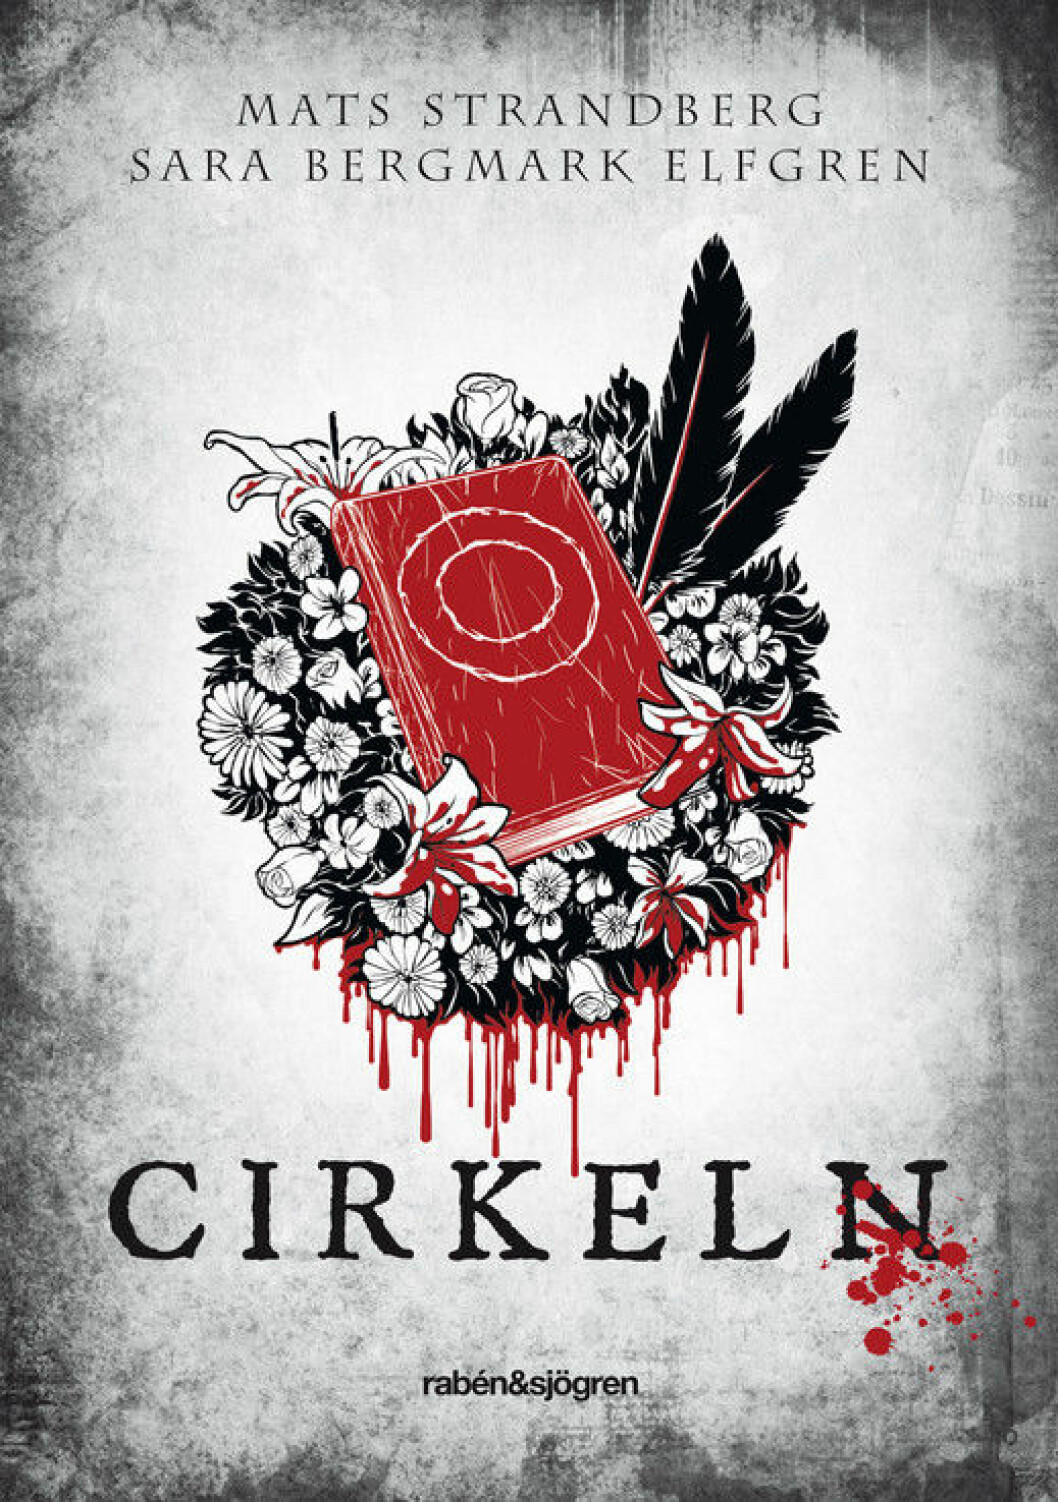 Cirkeln, en dystopisk bok av Mats Strandberg.